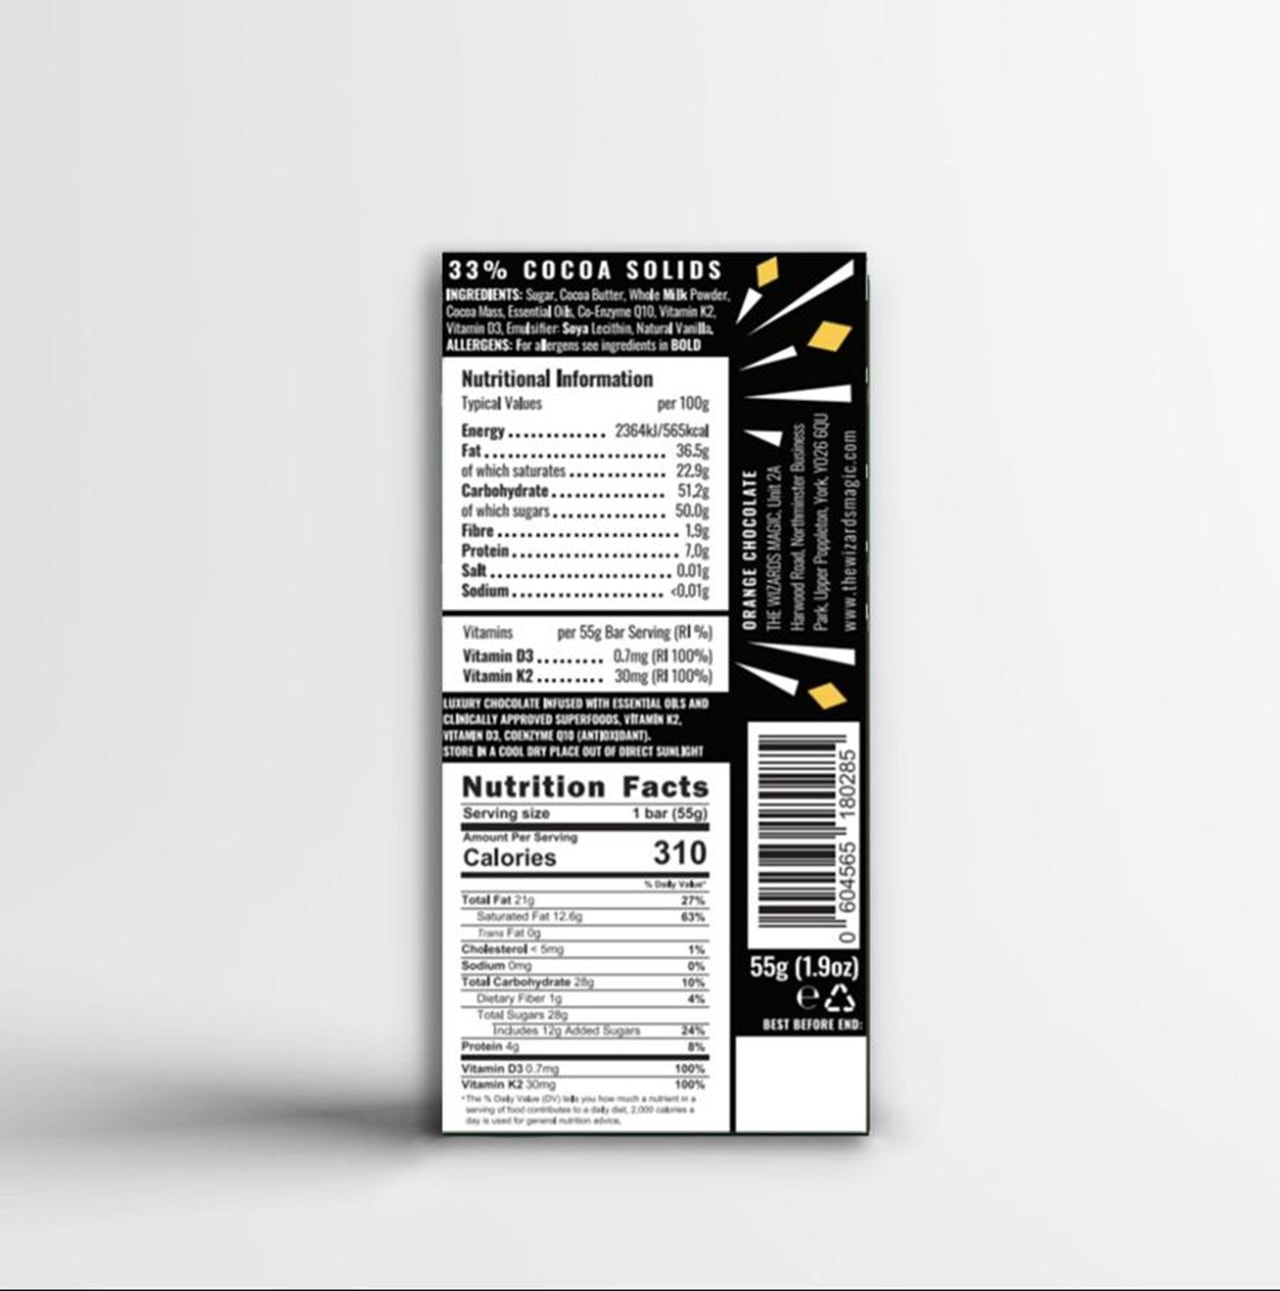 Wizards Magic Chocolate: Immunity Gift Pack: Orange & Caramel (Pack of 4) - 4